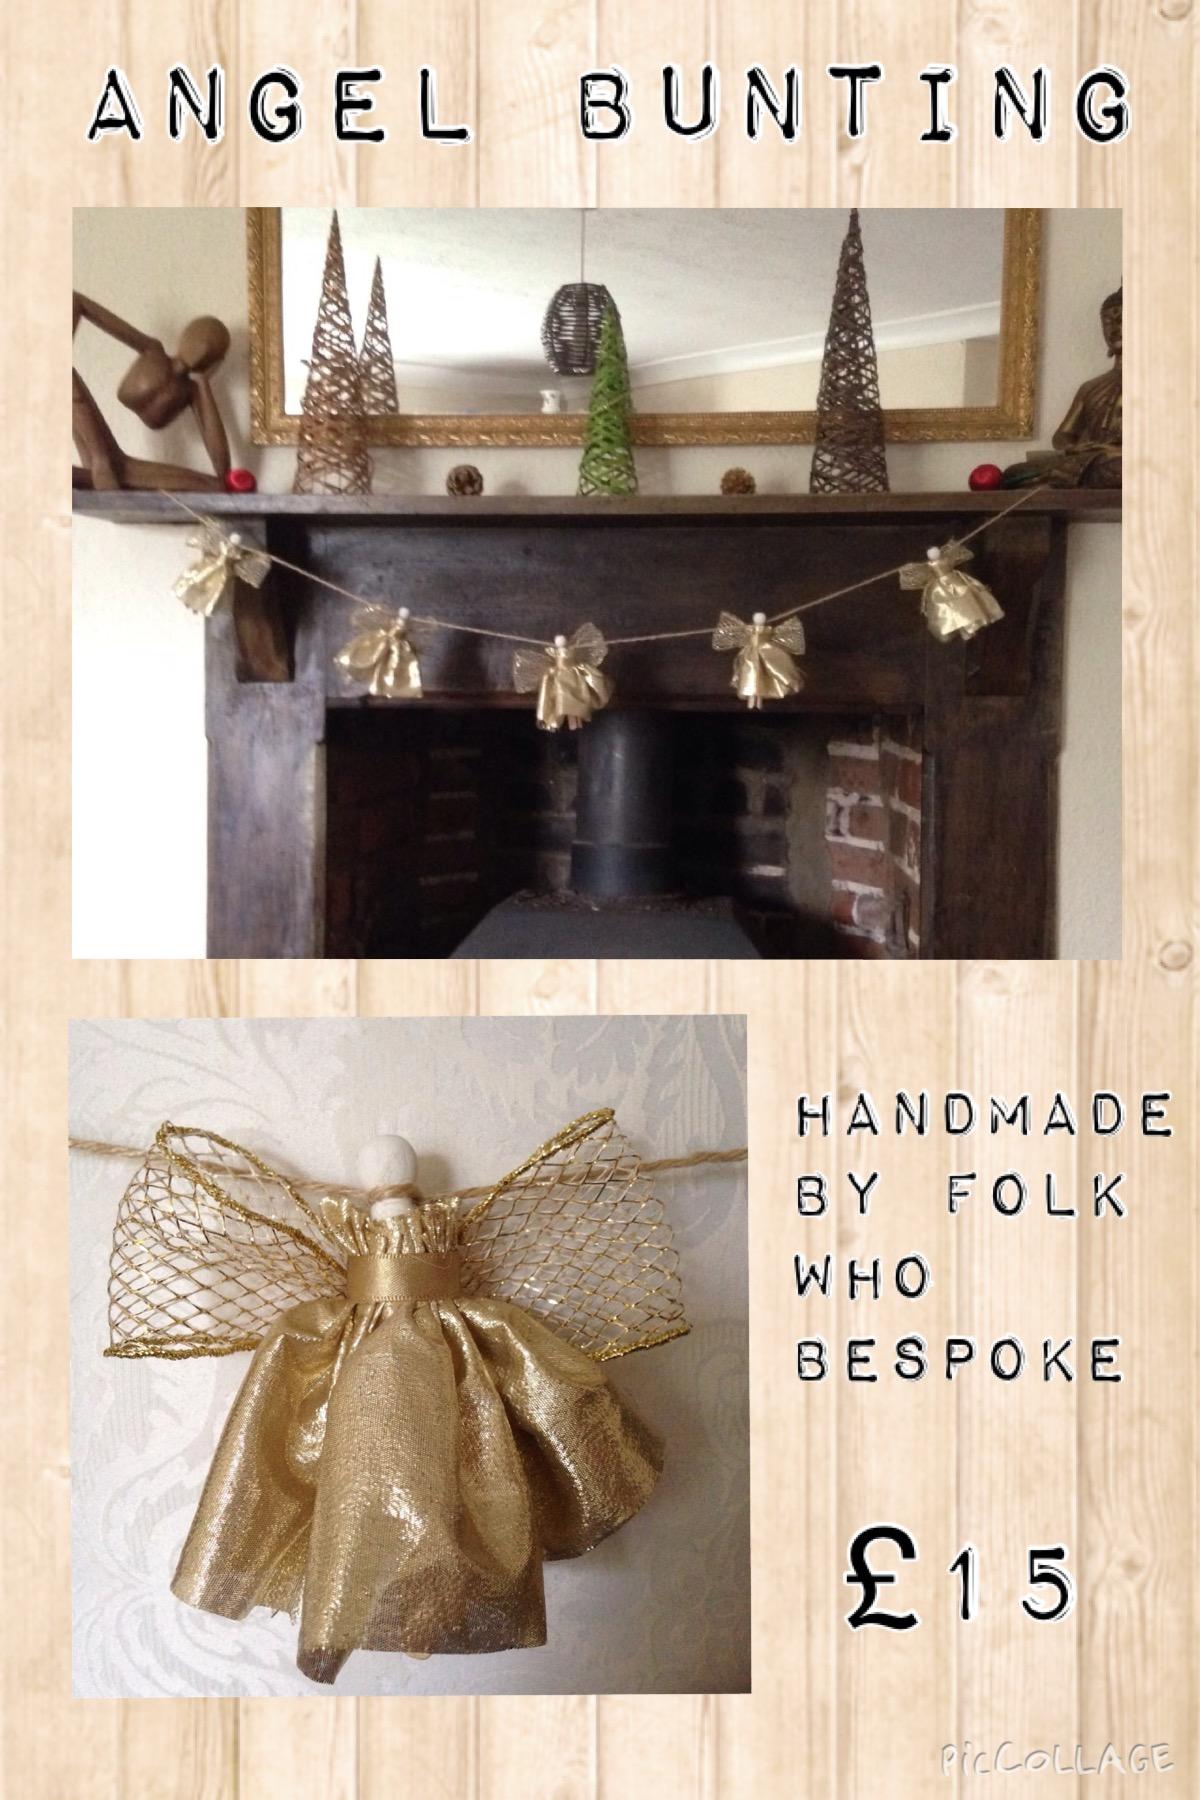 Handmade Angel Bunting